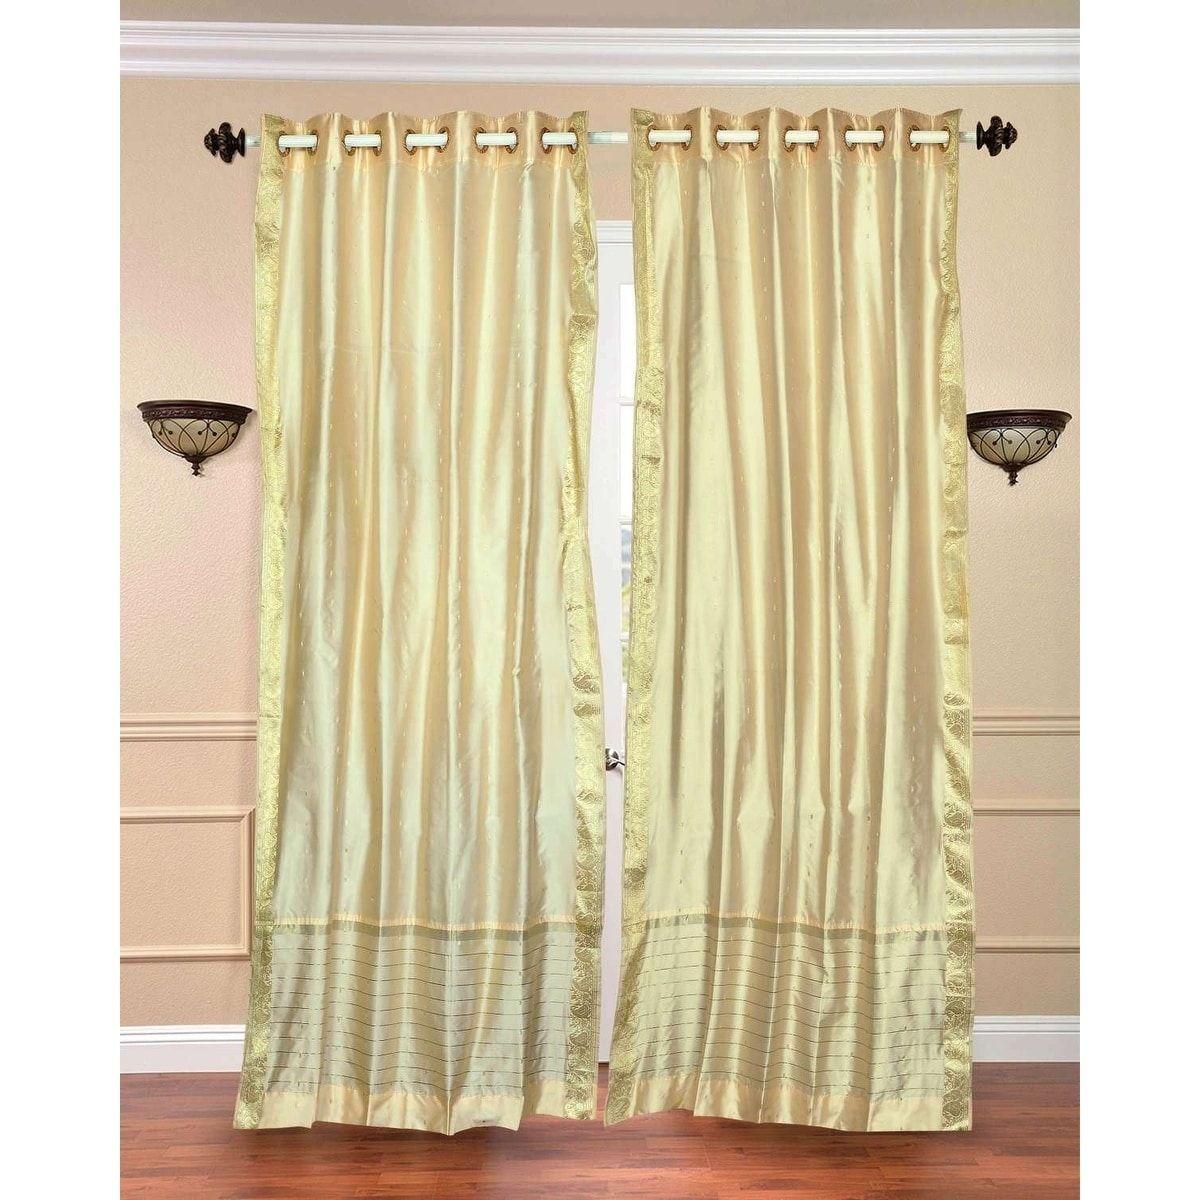 No curtain window ideas  indian selections cream ivory ring top sheer sari curtain  drape